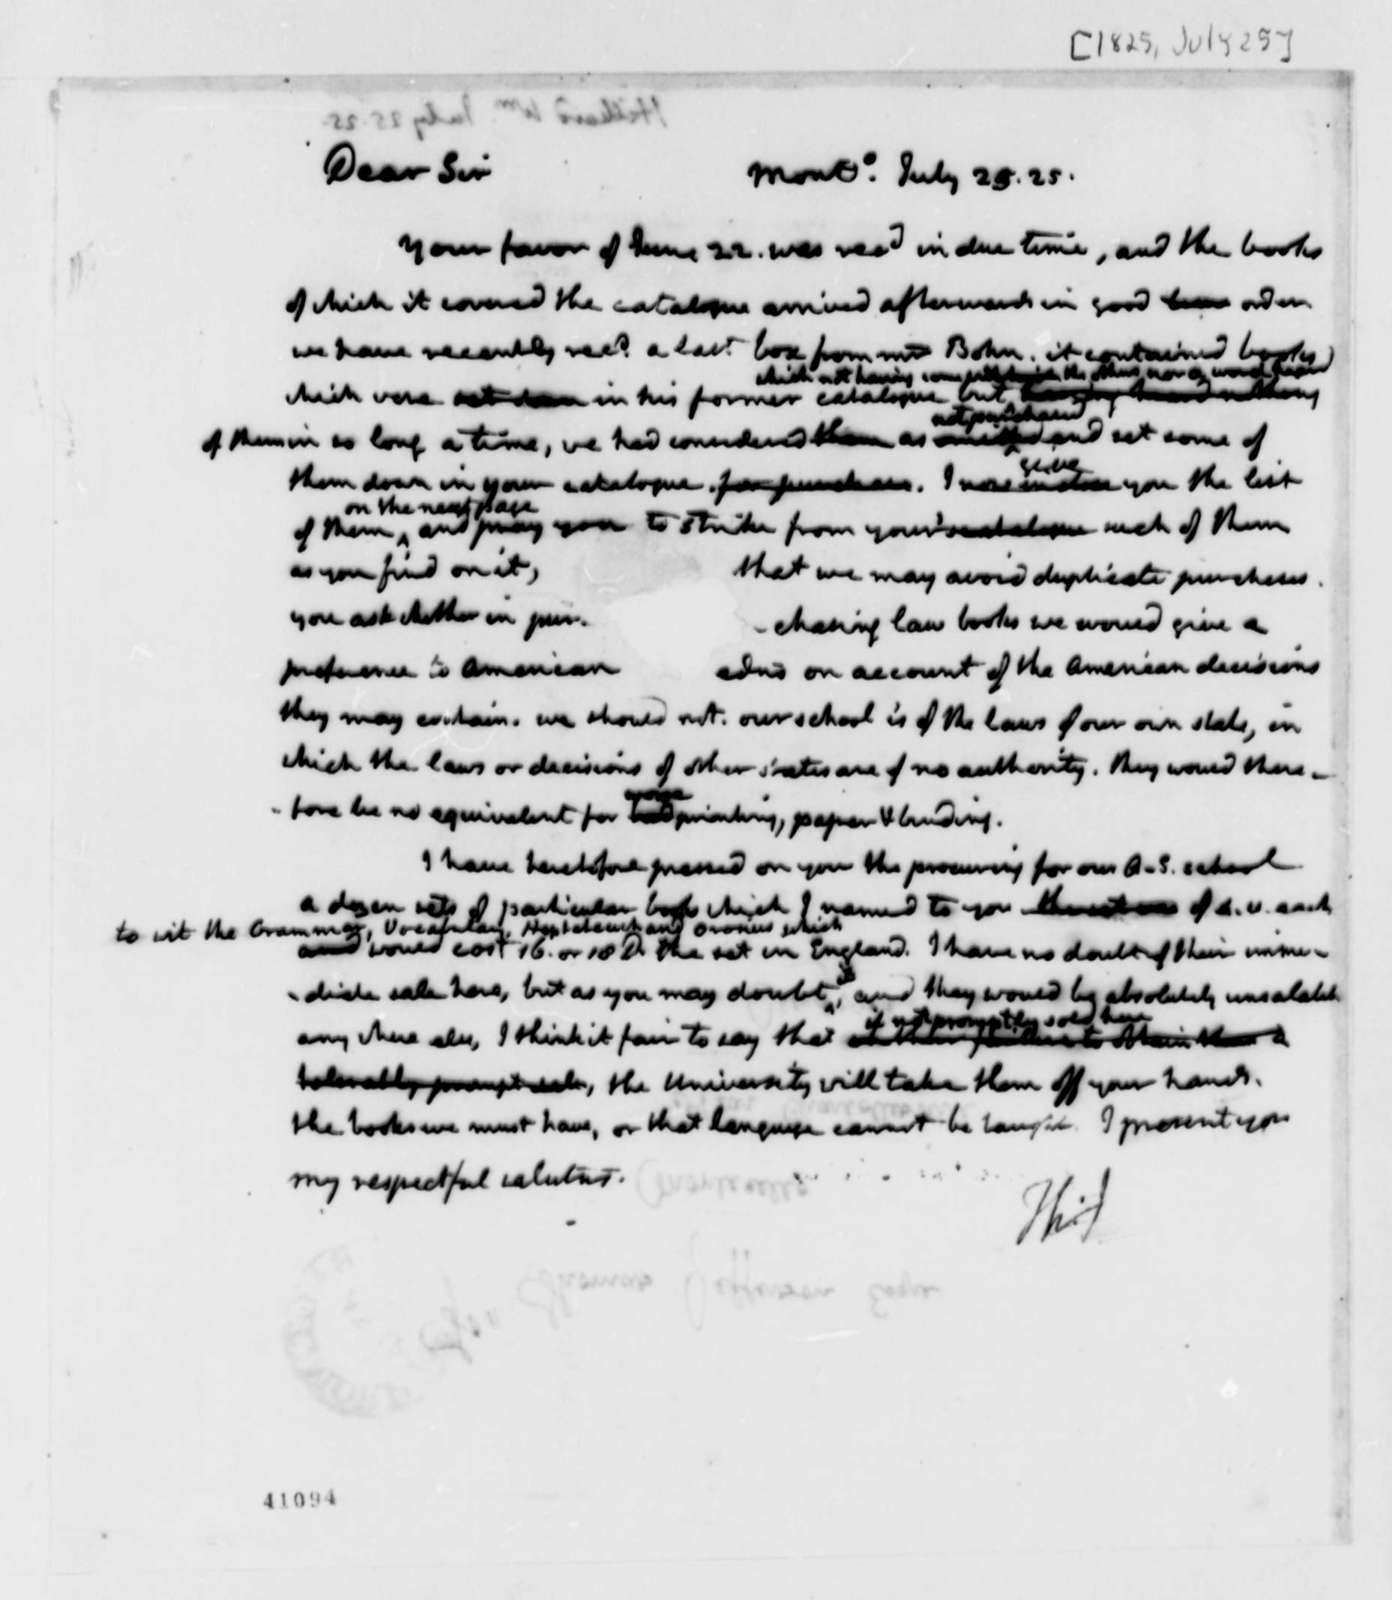 Thomas Jefferson to William Hilliard, July 25, 1825